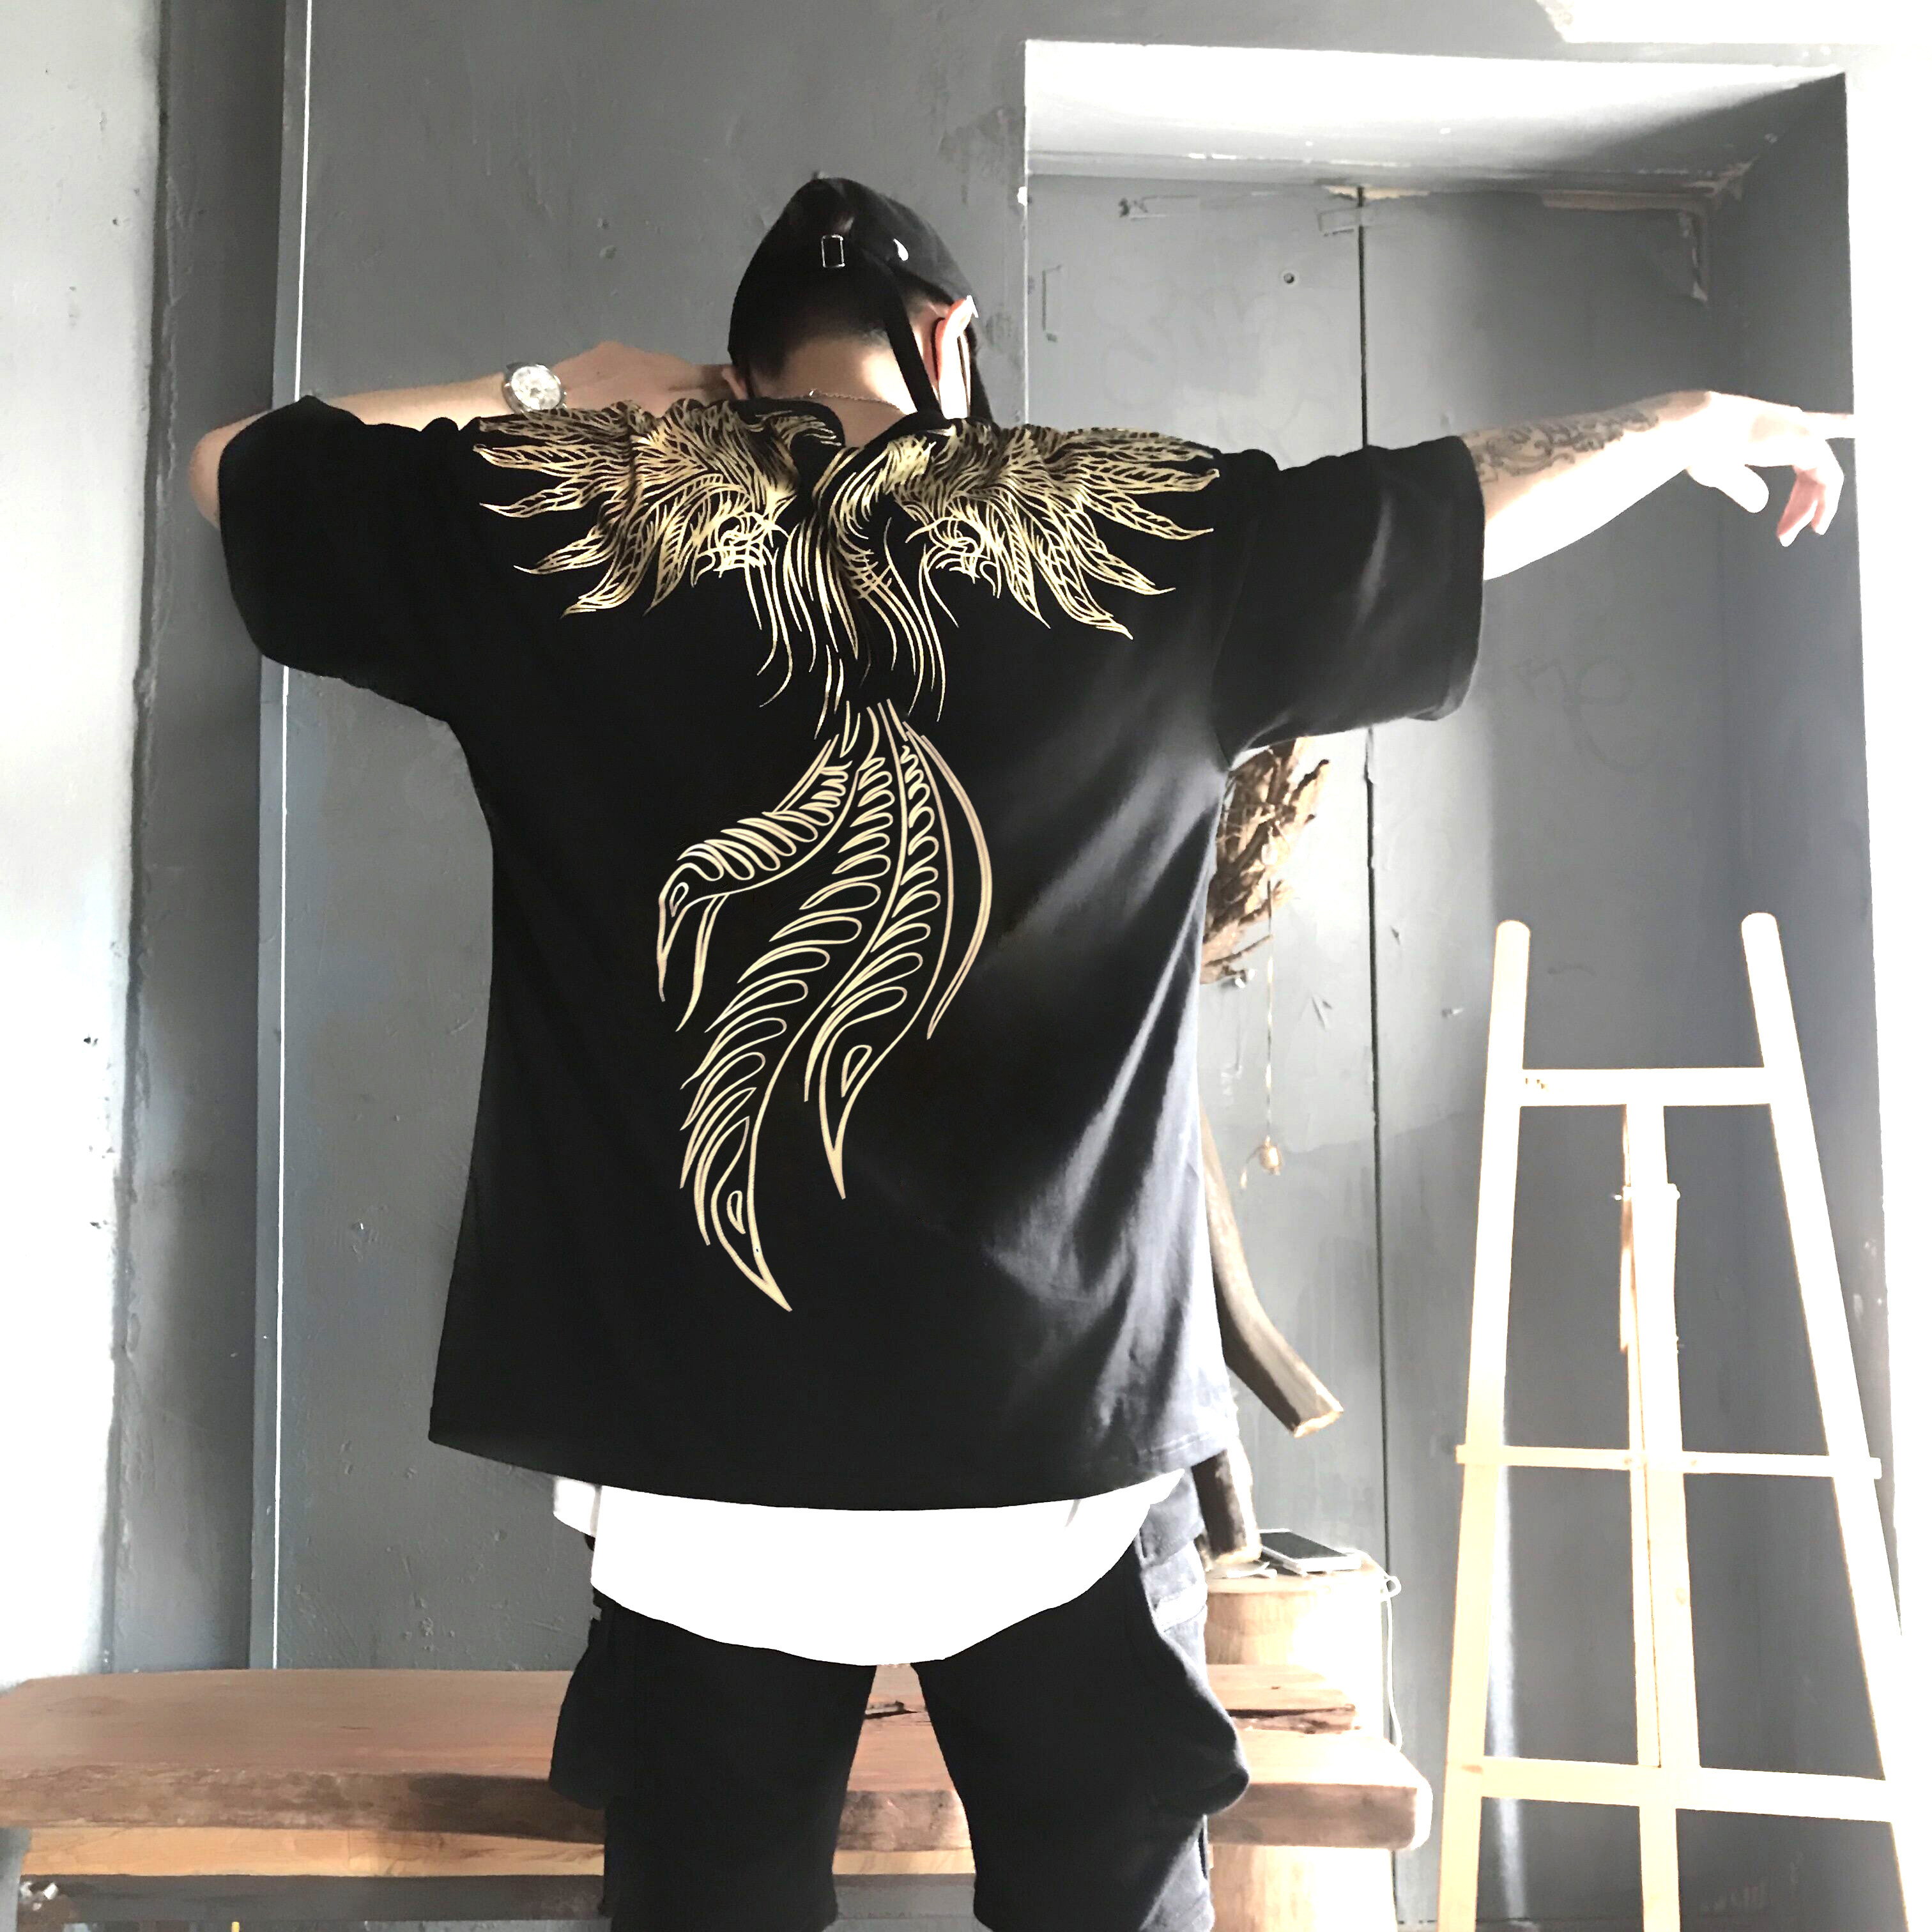 ins超火同款国潮新款凤凰翅膀短袖男女情侣宽松嘻哈hiphop上衣T恤